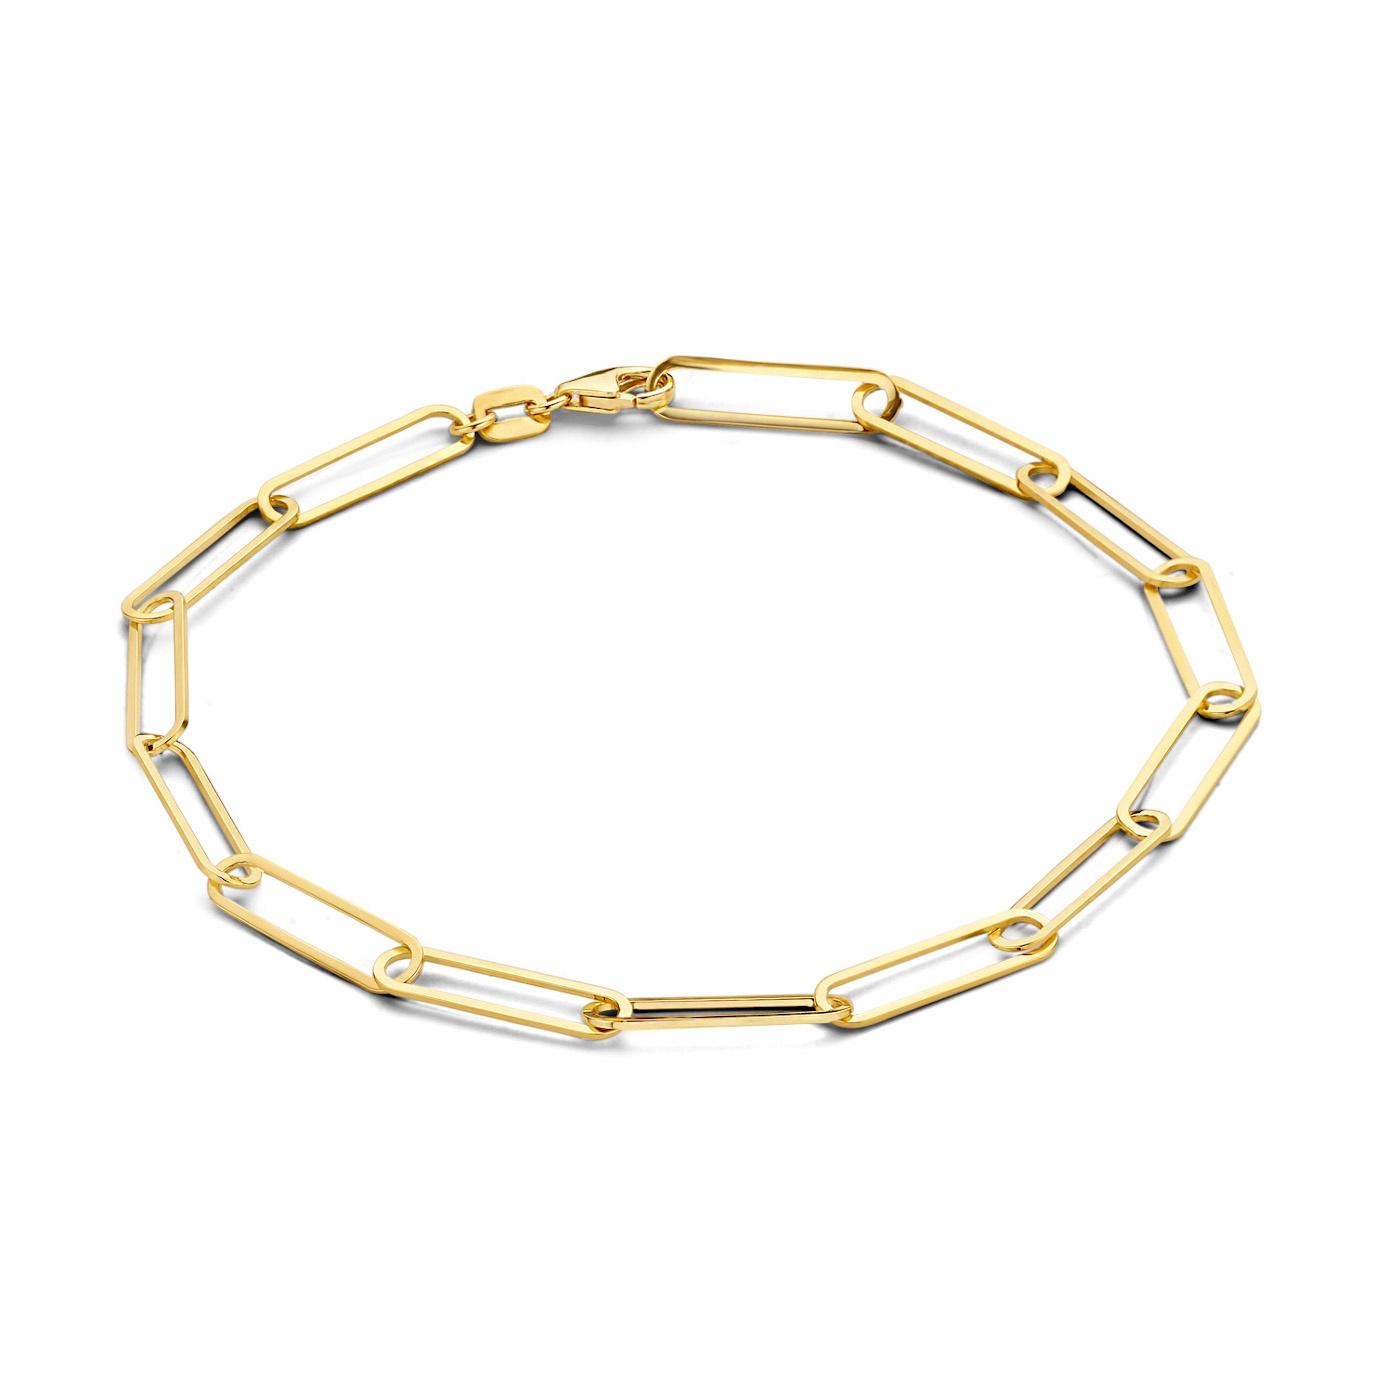 Isabel Bernard Aidee Odile 585er Gold Gliederarmband